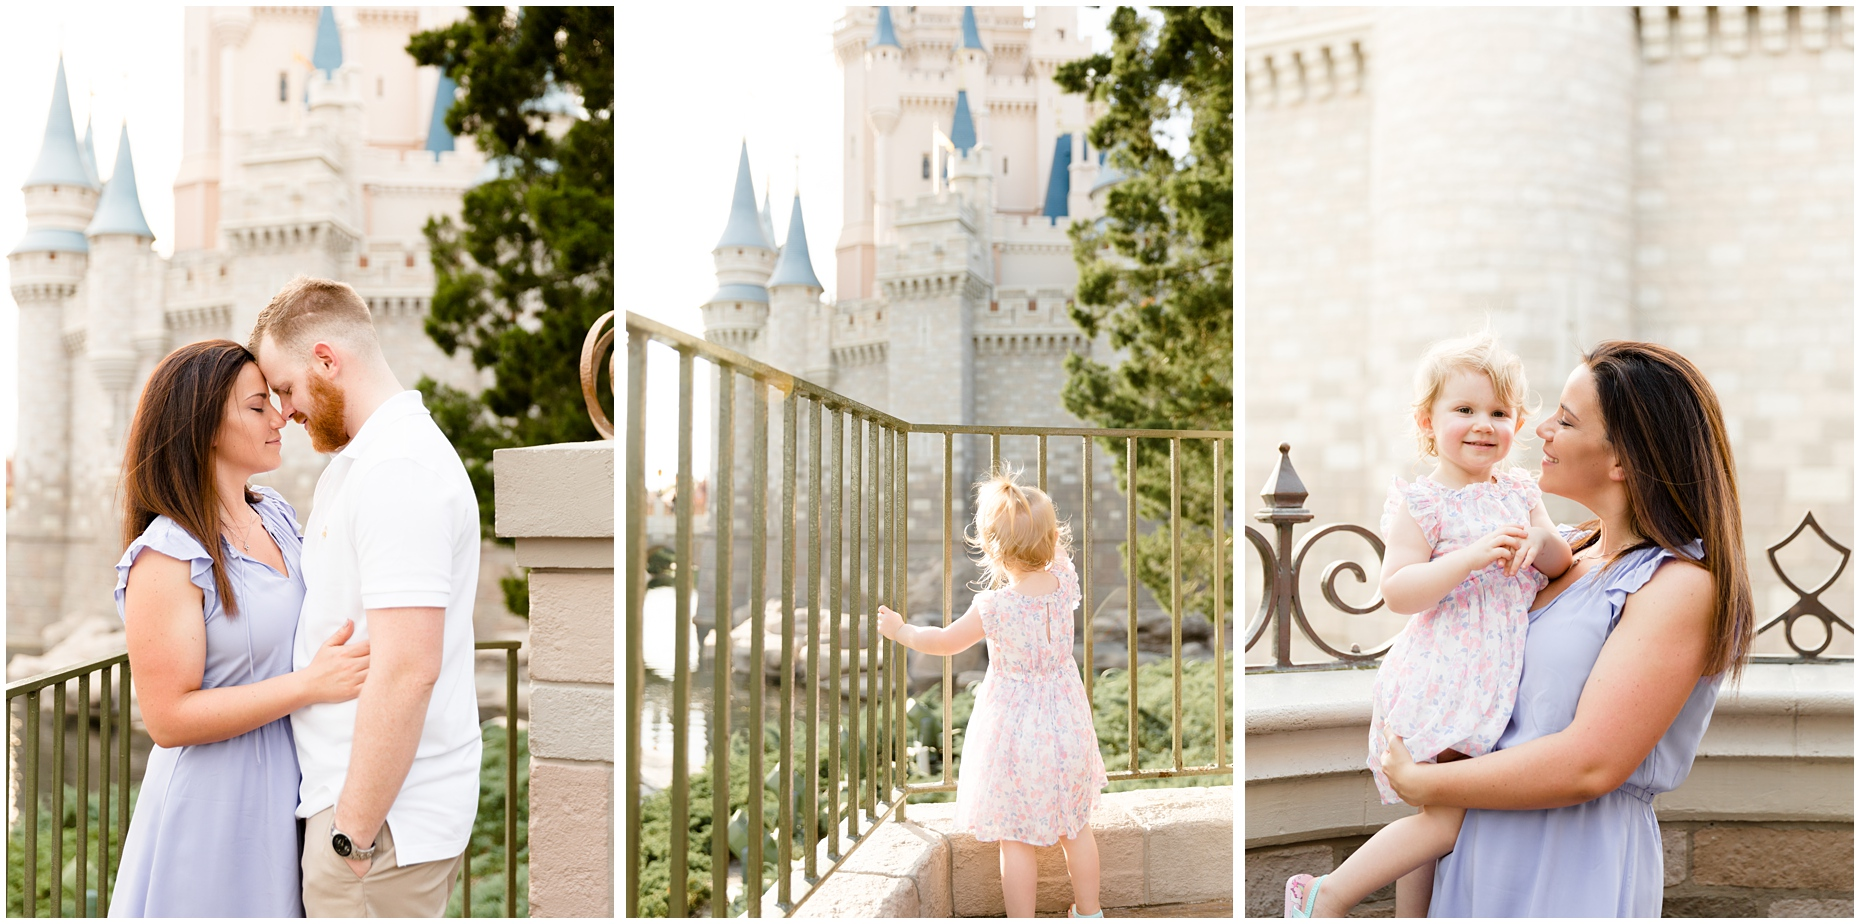 Pennell_Magic_Kingdom_Disney_World_Photographer_Photography_Orlando_Florida